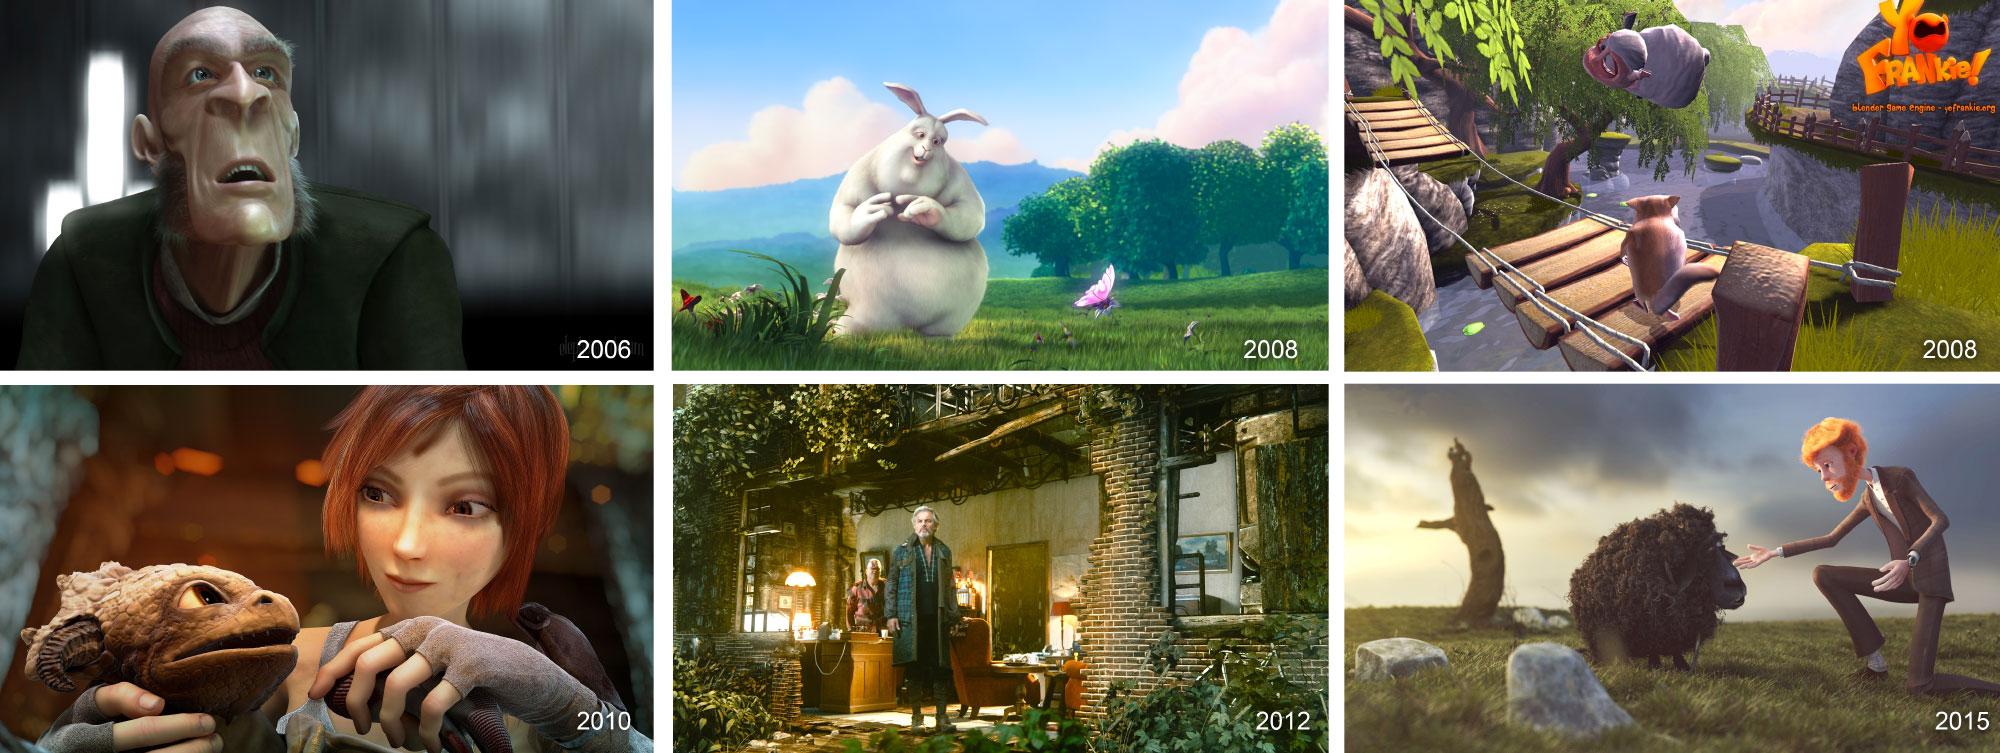 Top: Elephants Dream, Big Buck Bunny, Yo, Frankie!, Bottom:  Sintel, Tears of Steel, Cosmos Laundromat